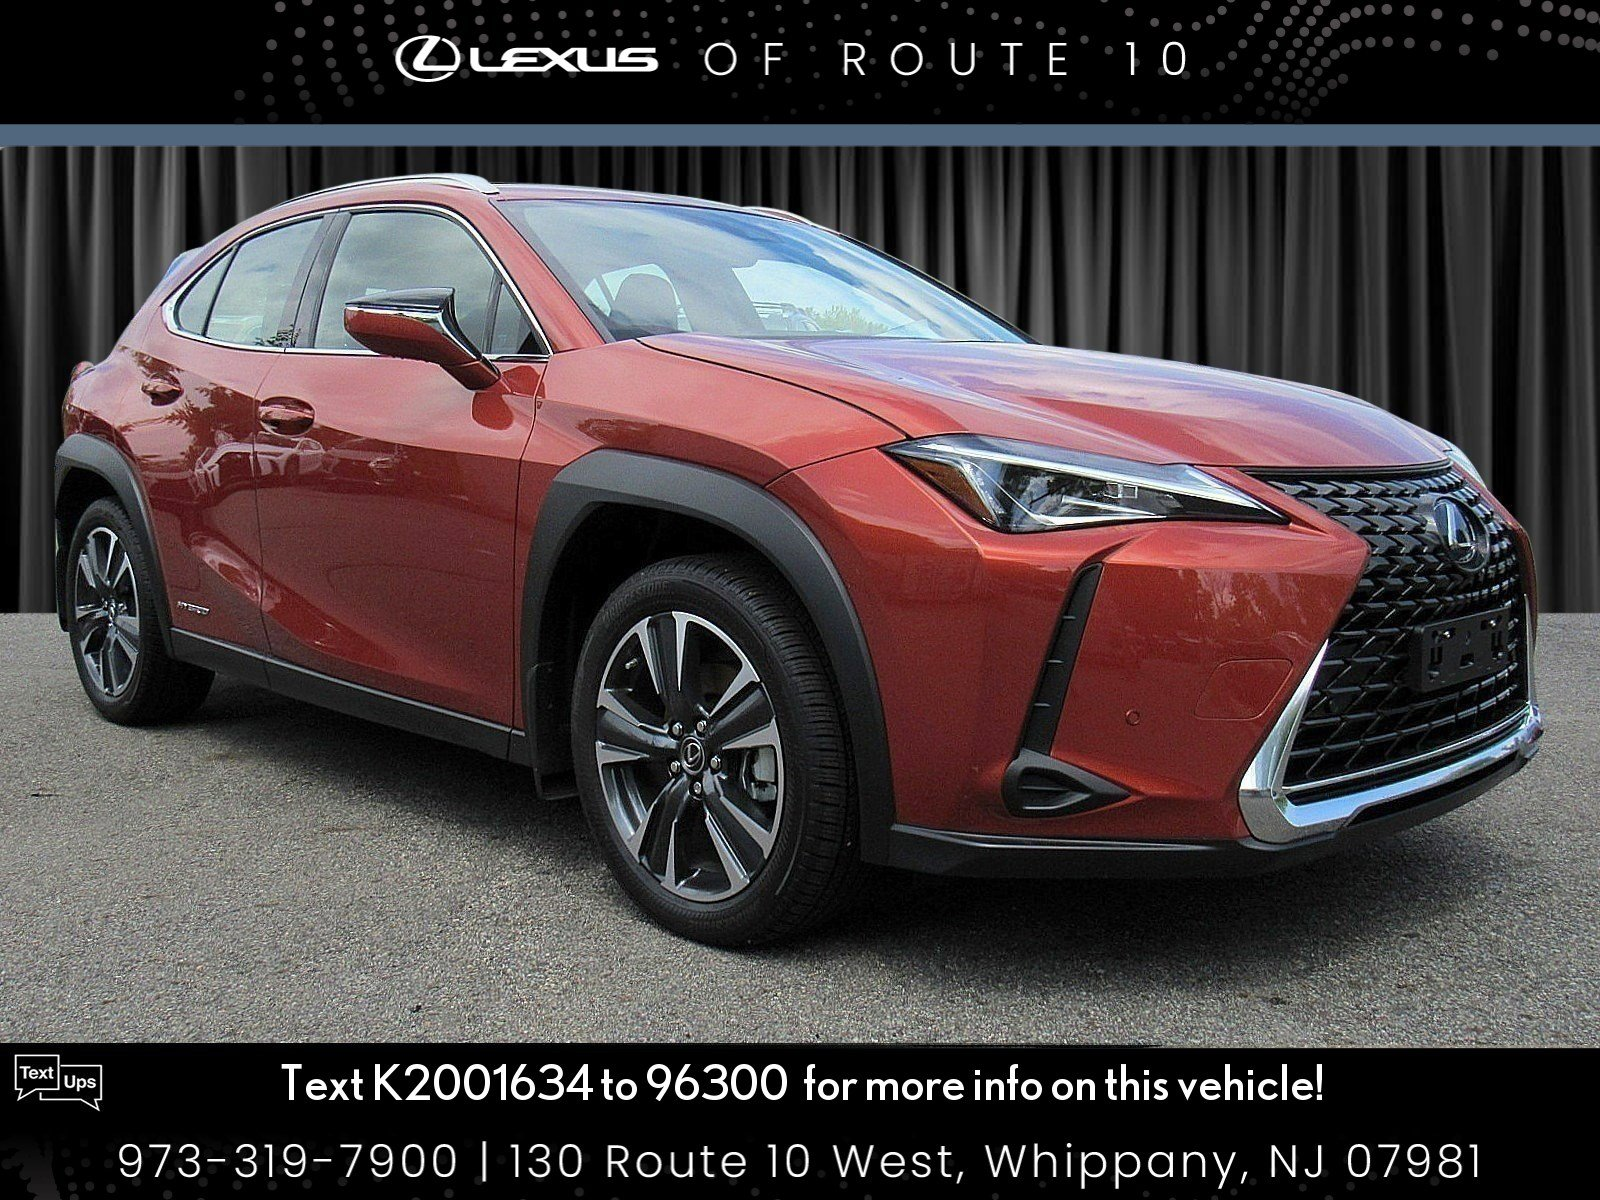 New 2019 Lexus UX UX 250h